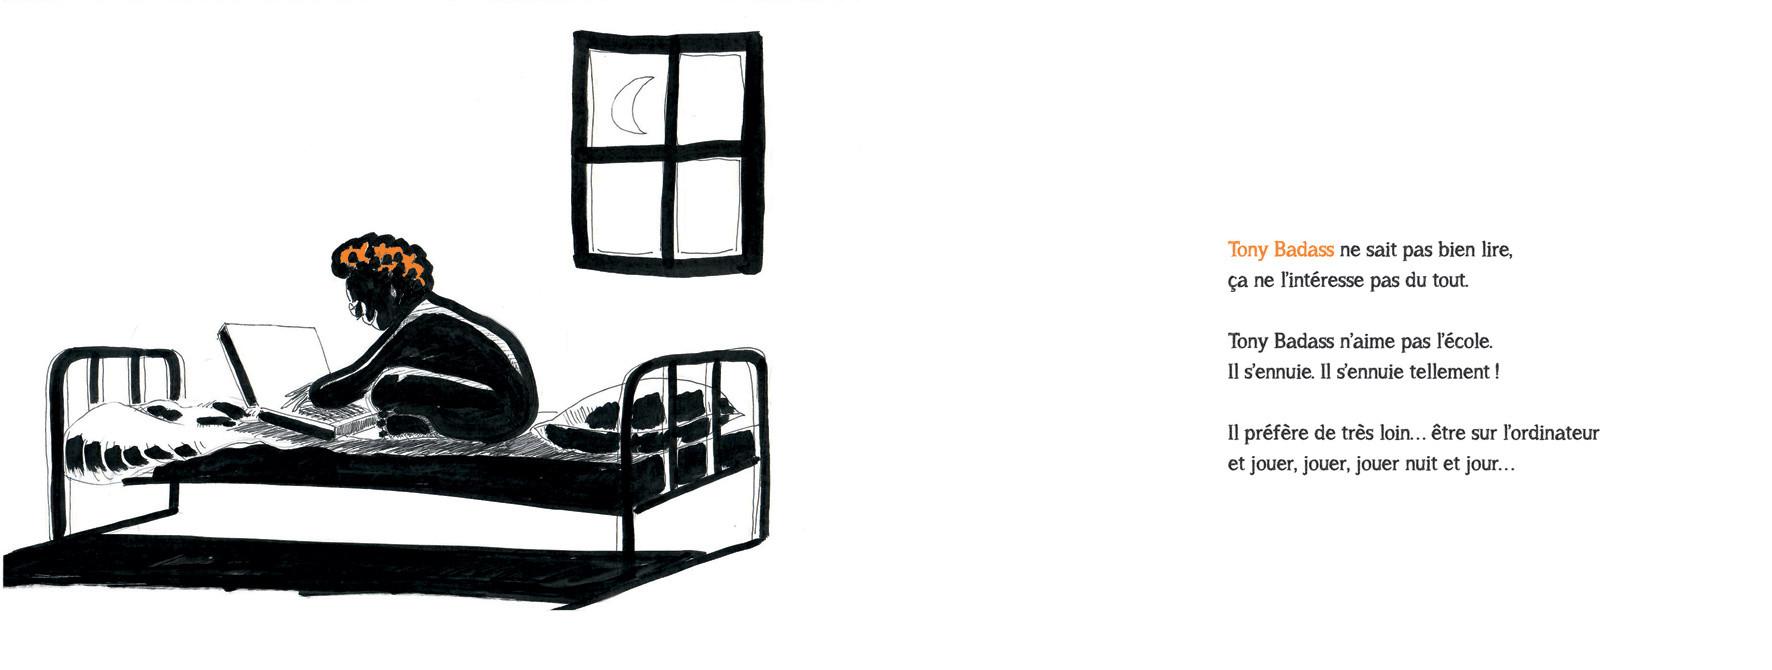 l histoire de tony badass le fou de jeux vid o de marc taupin clozel sarah taupin l 39 autre. Black Bedroom Furniture Sets. Home Design Ideas